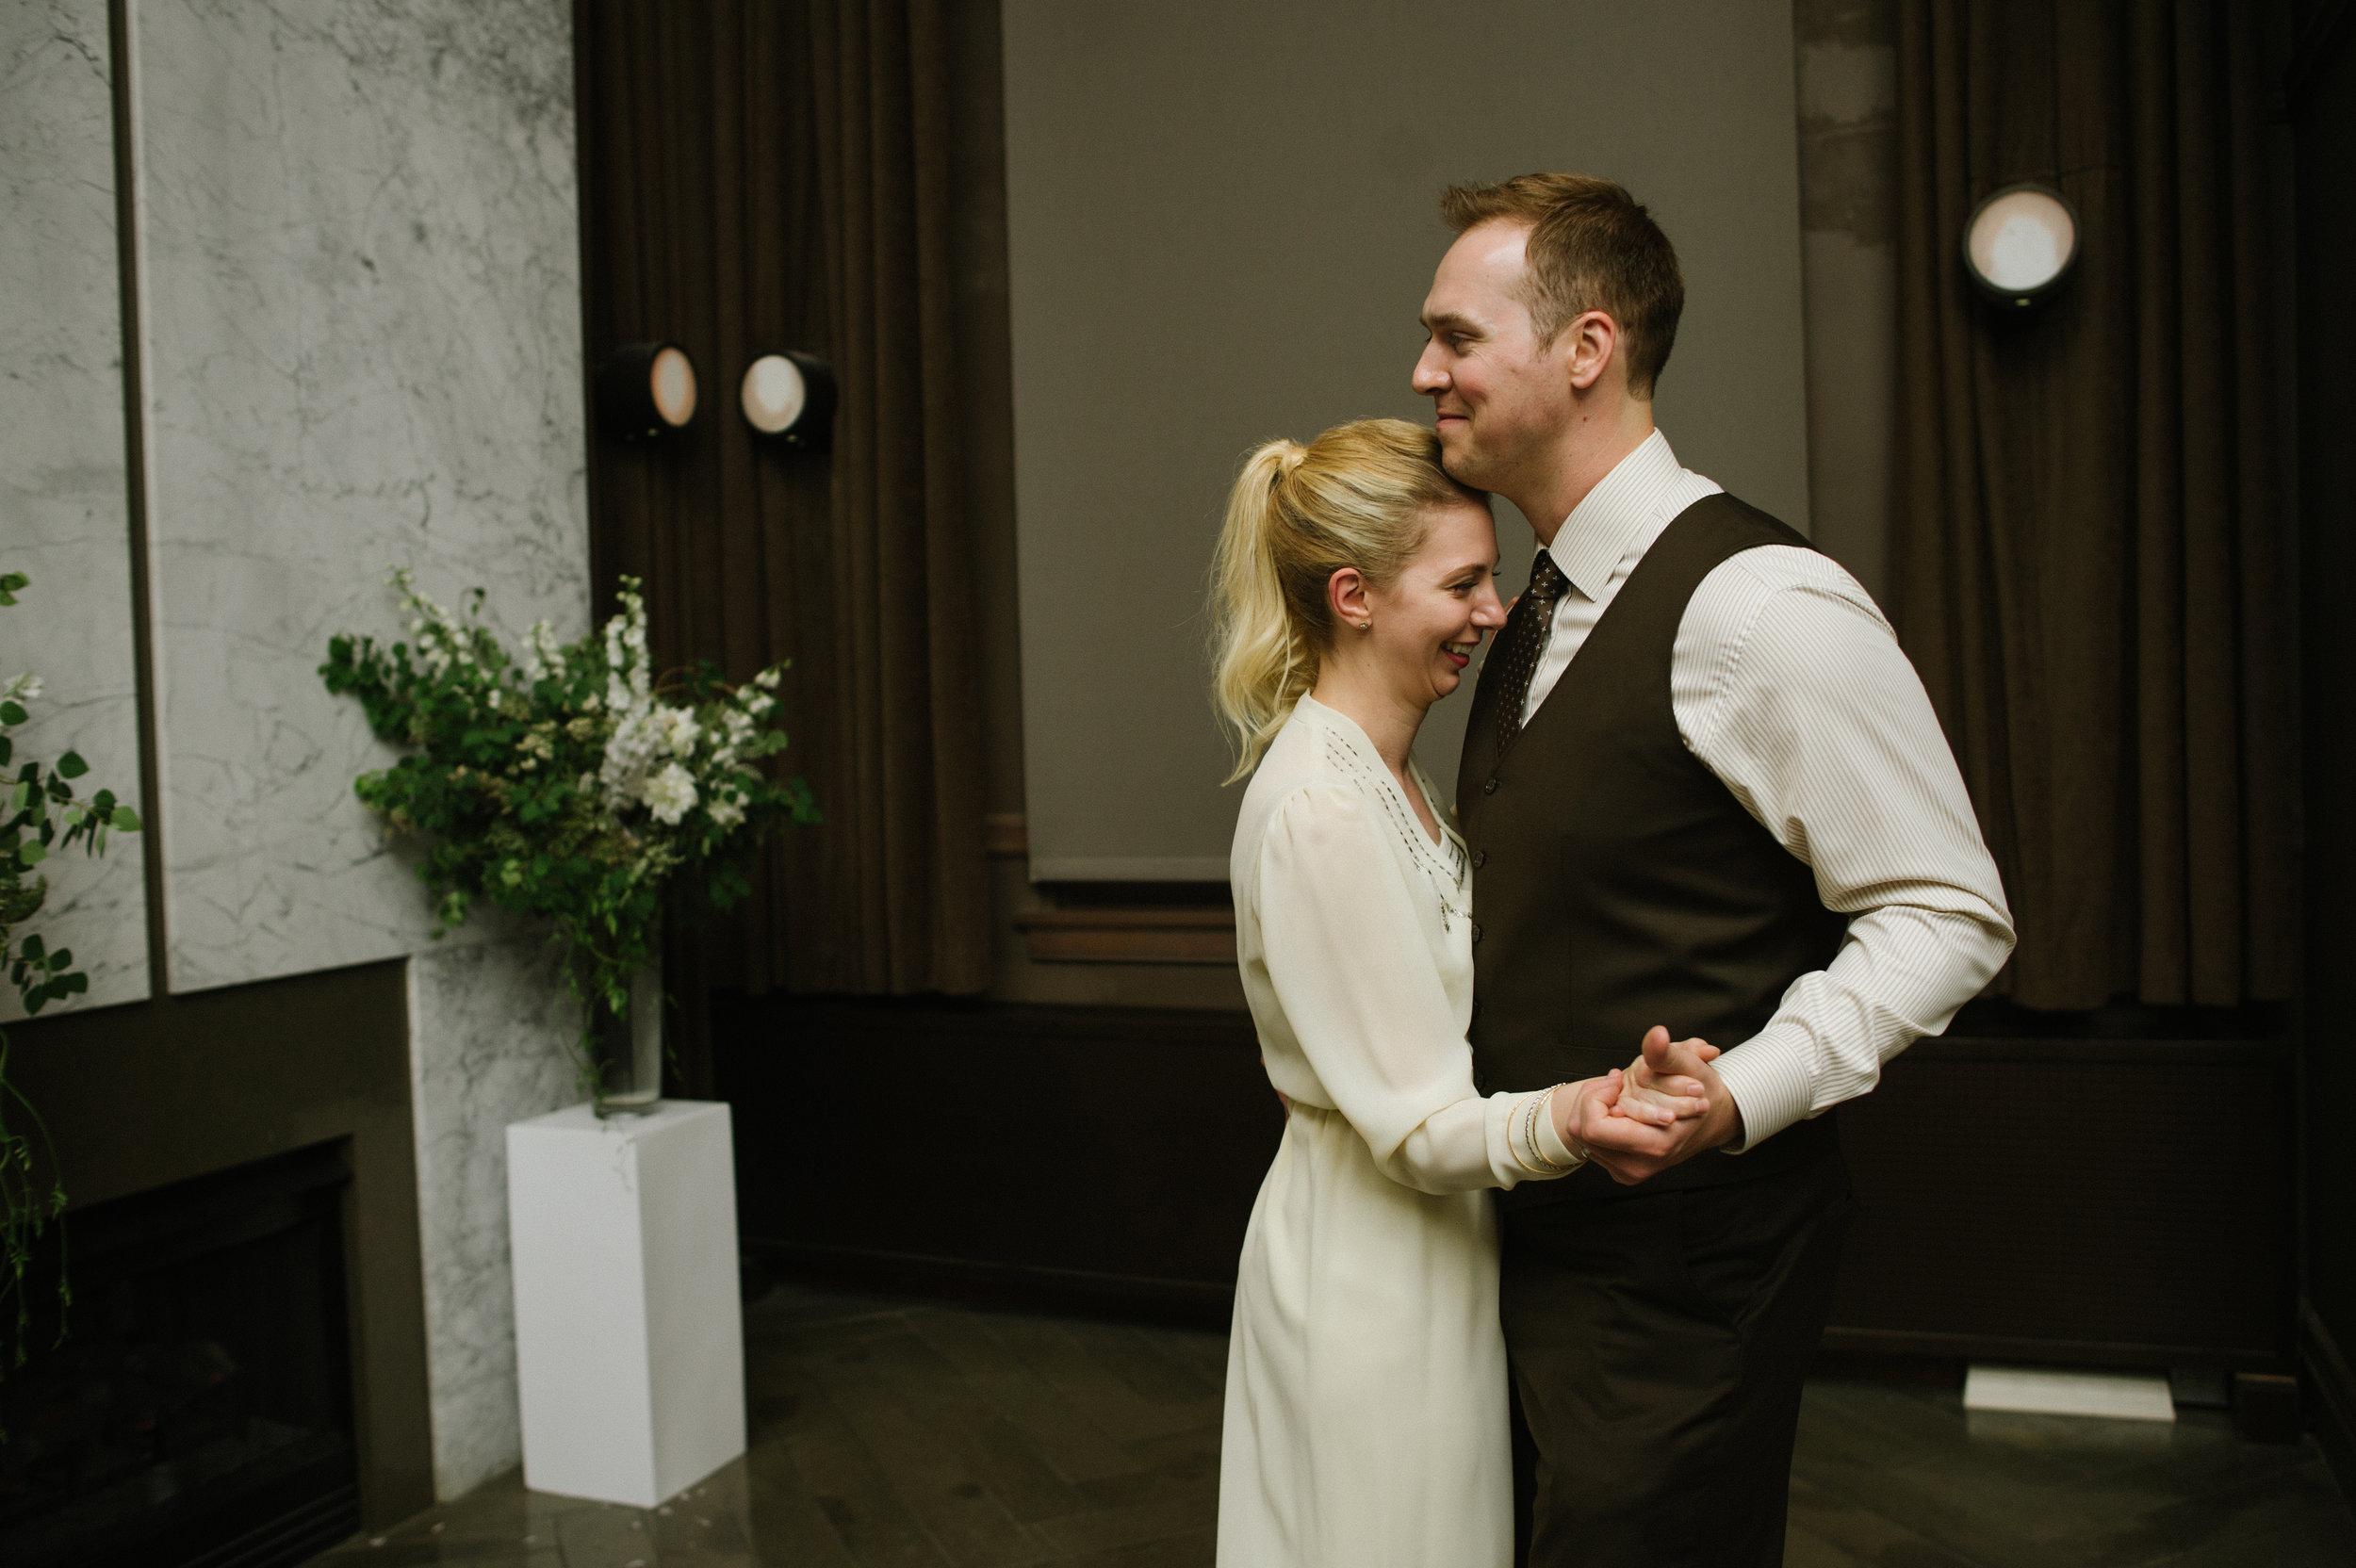 Teatro_Wedding_Calgary_Wedding_Photography_Vanessa_Tom_Married_2018_HR638.jpg